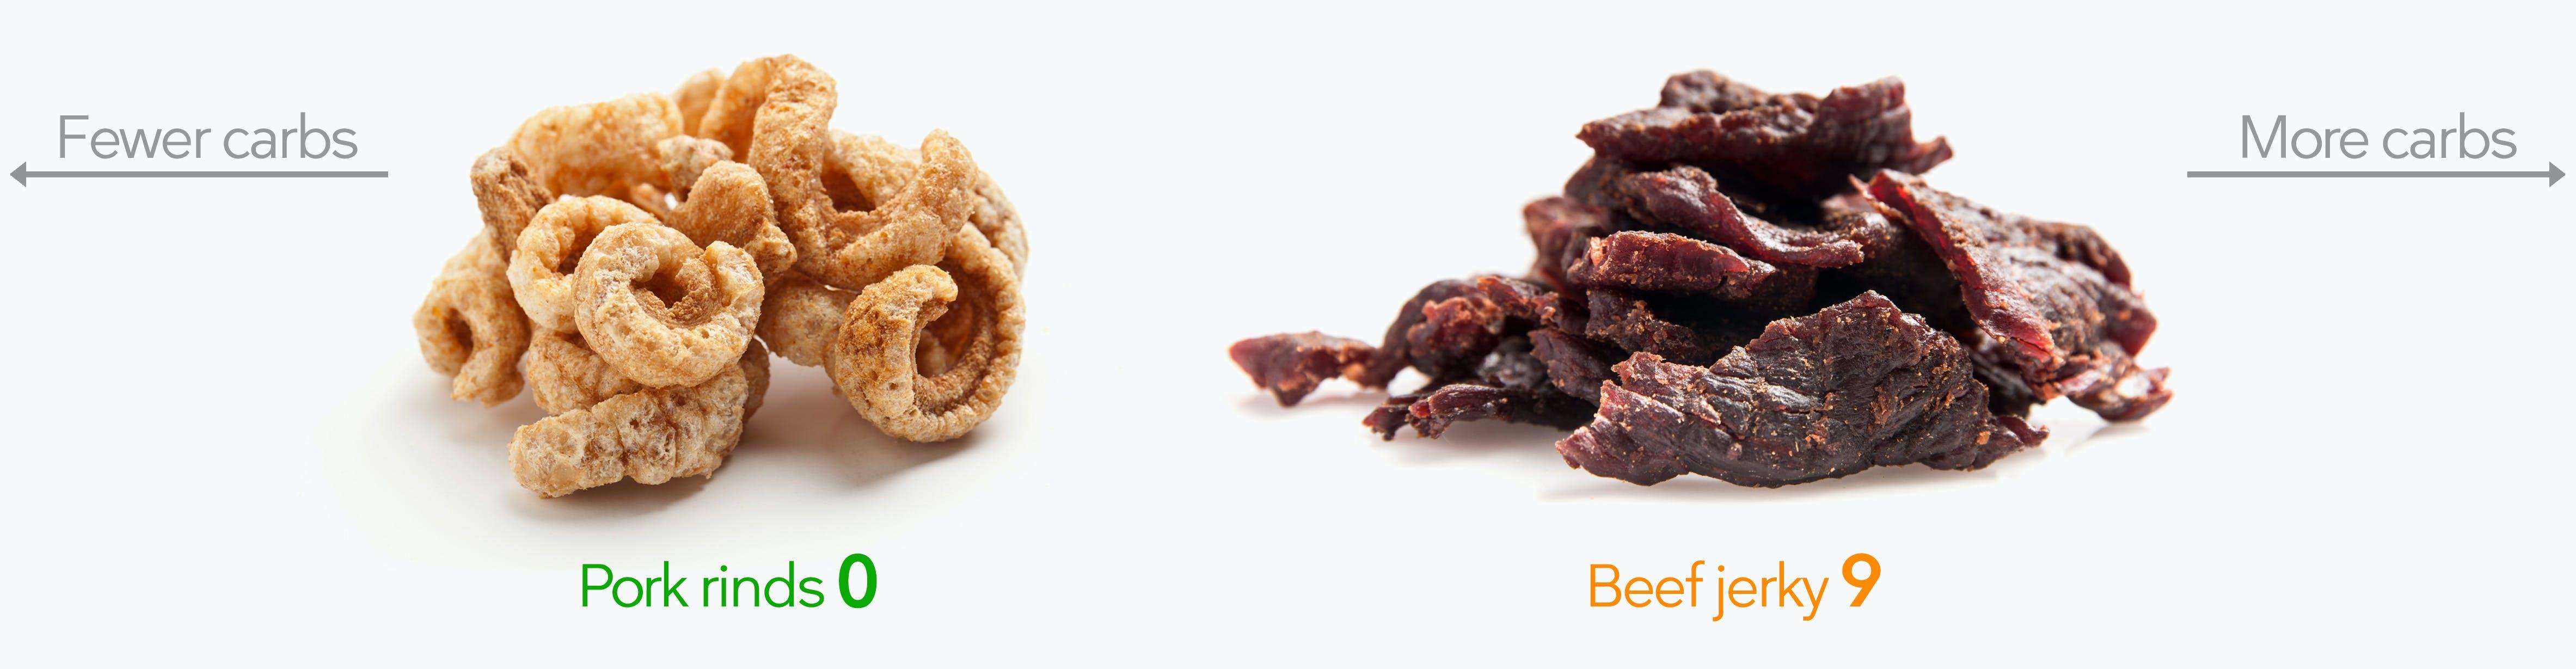 Keto snacks: pork rinds and beef jerky